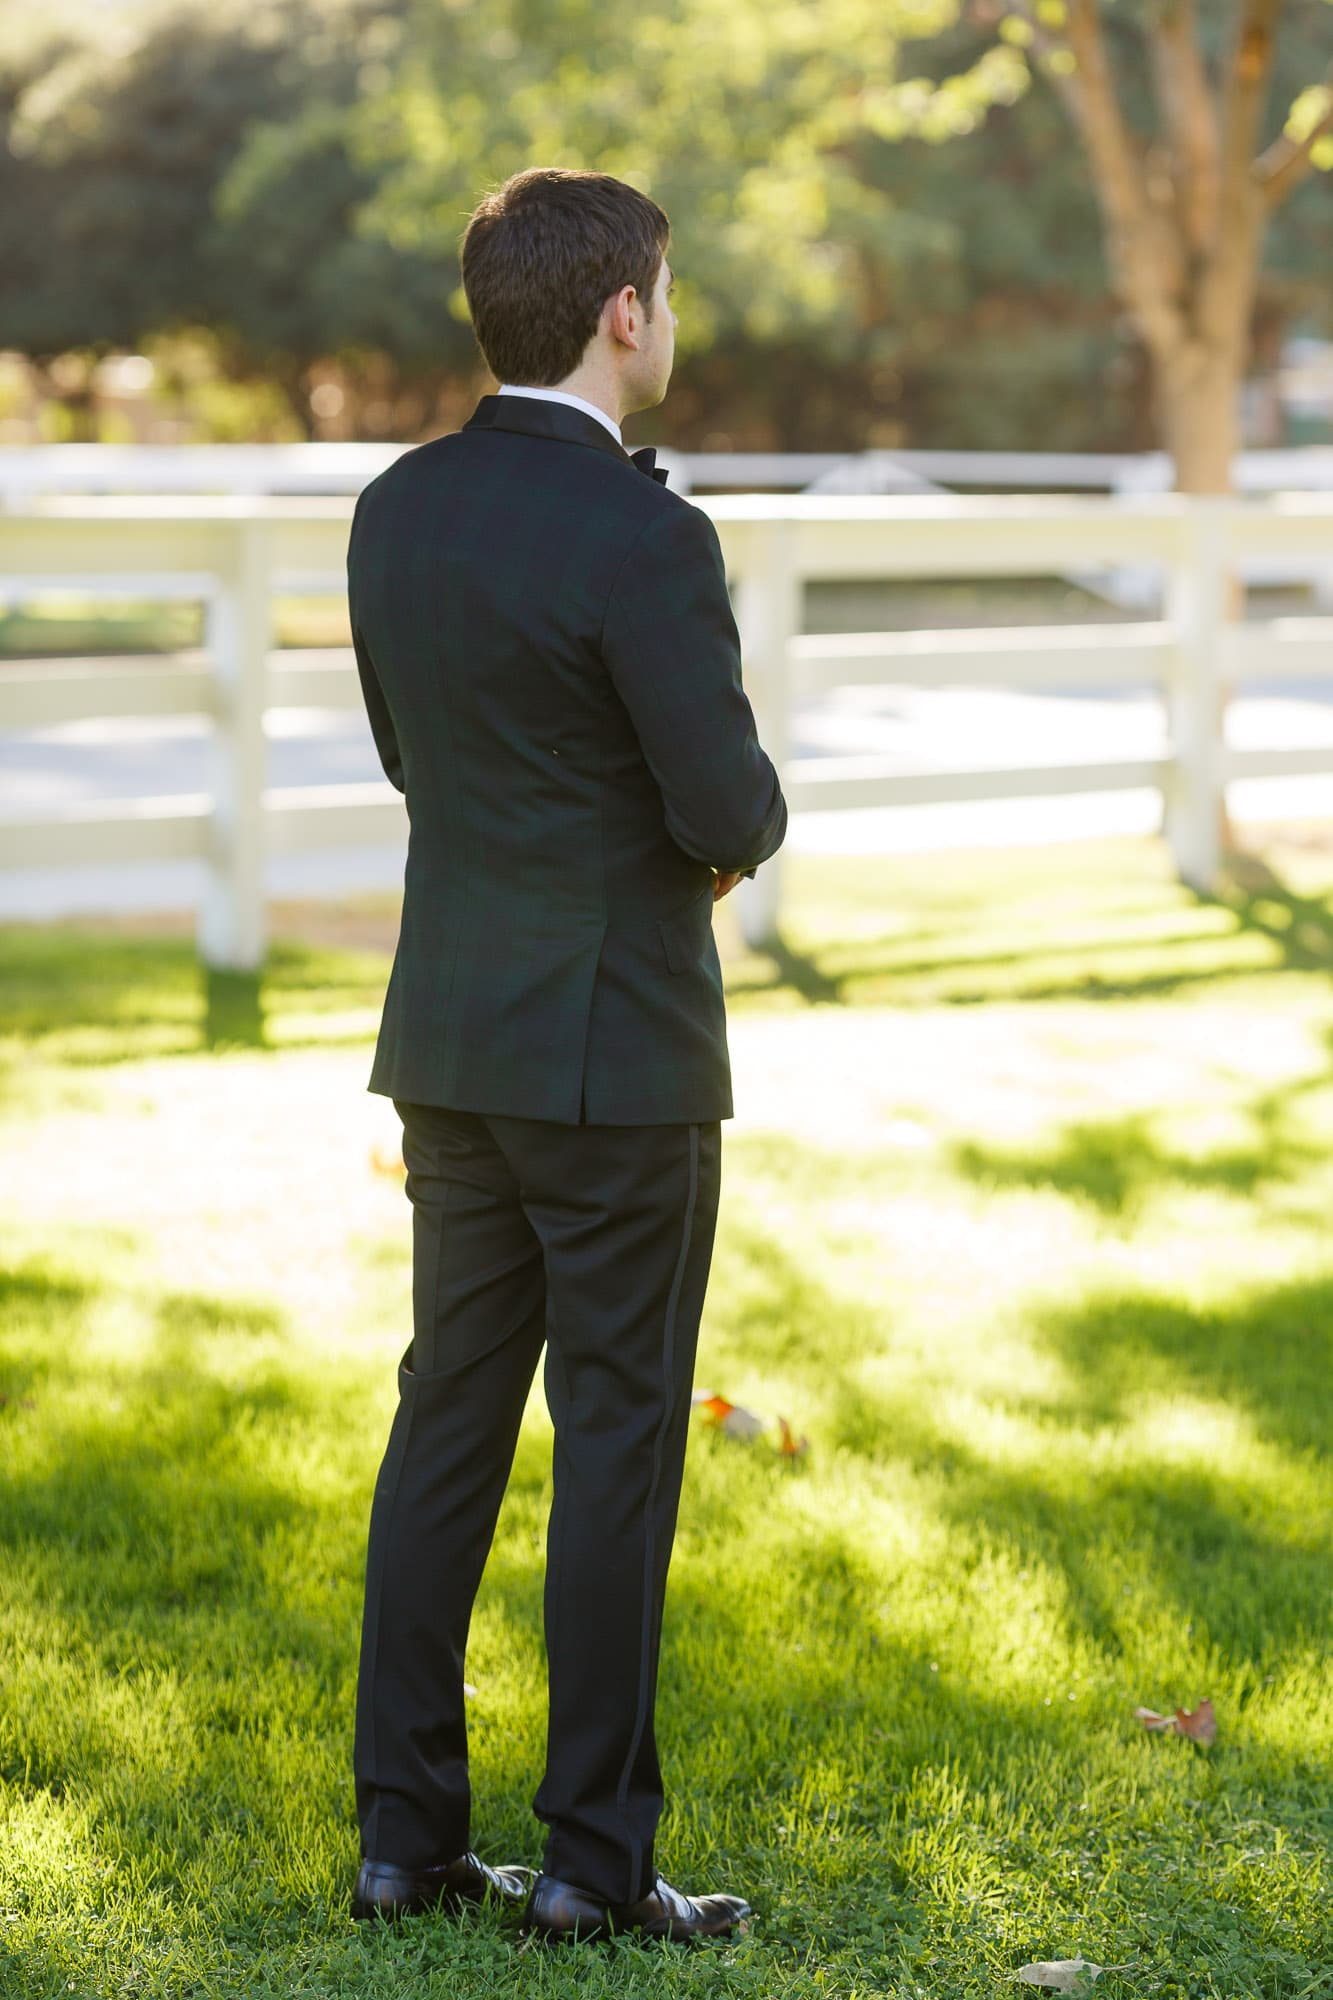 017_Alan_and_Heidi_Los_Angeles_Equestrian_Center_Wedding